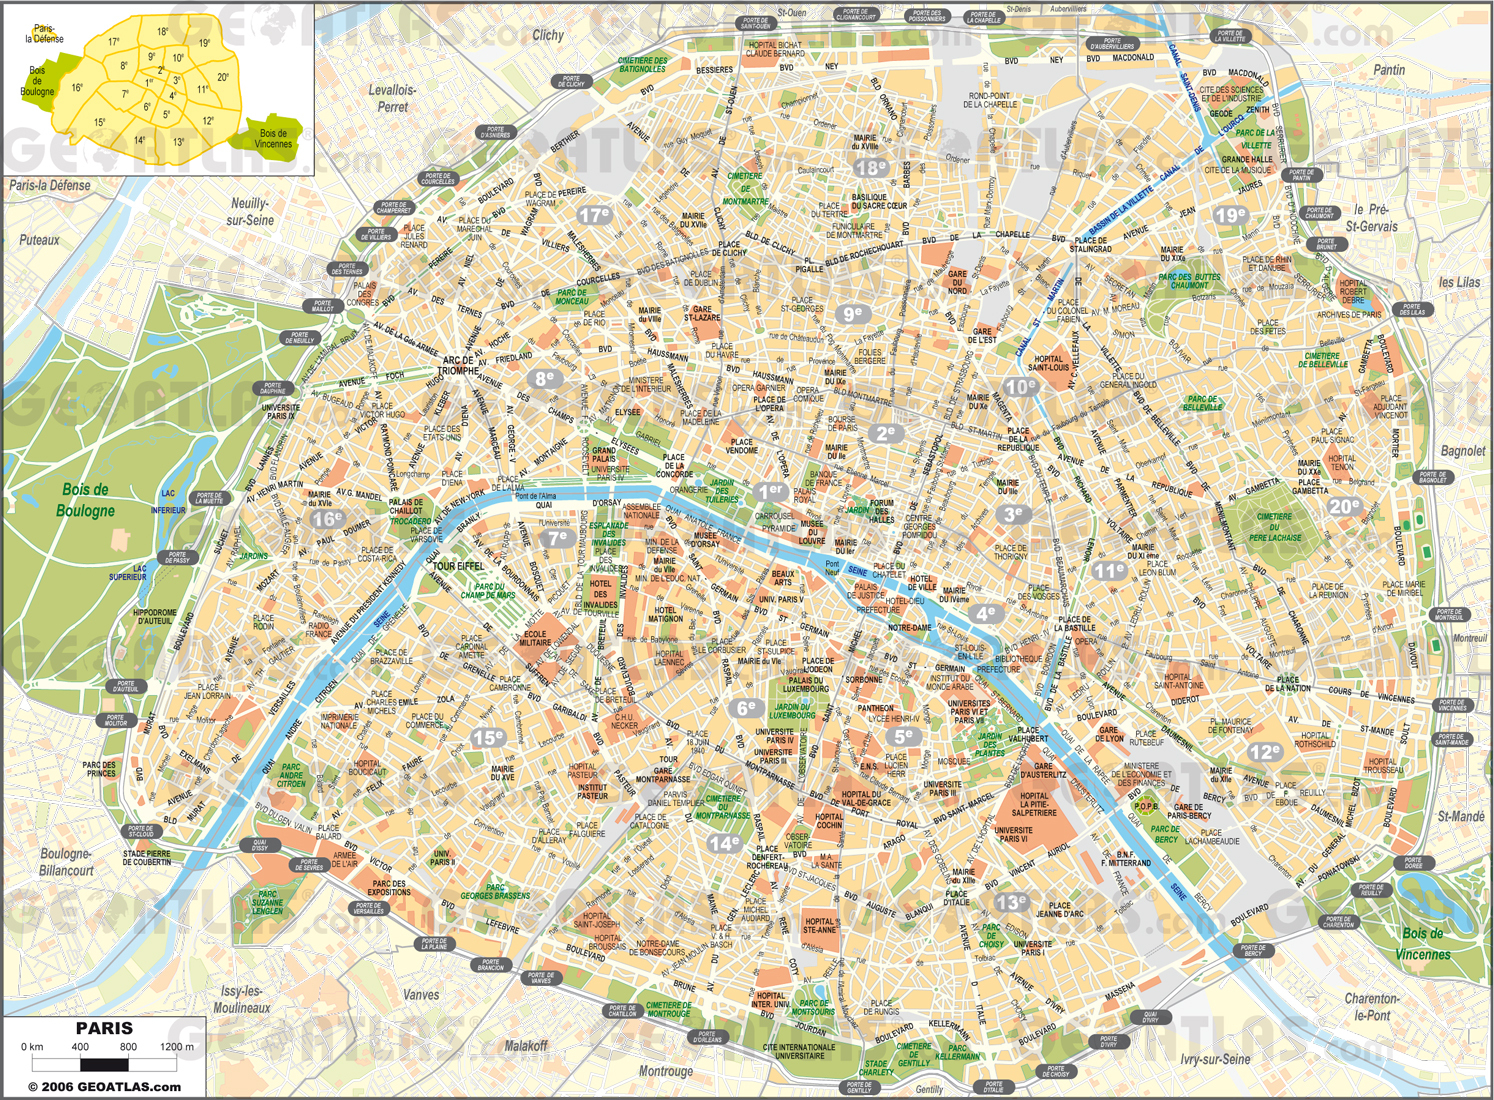 Printable Street Map Of Paris Printable Street Map Paris   Travel - Paris Street Map Printable